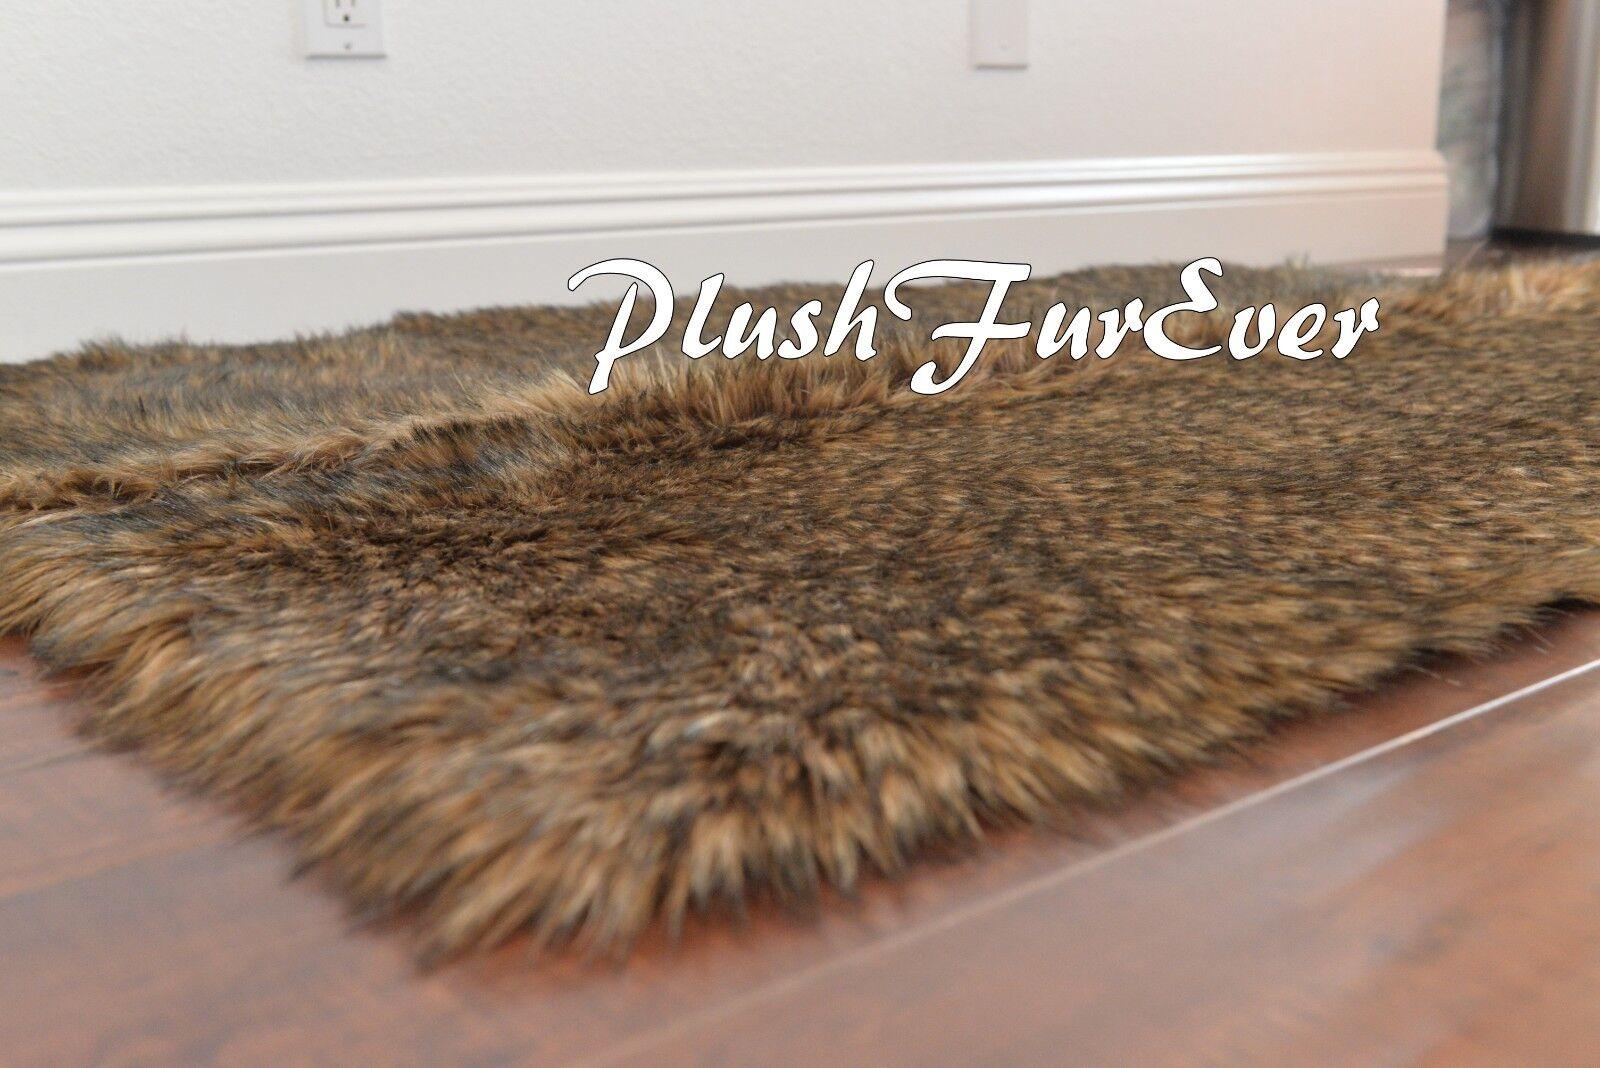 PlushFurEver Faux Fur Rug  Coyote Skin Animal Pelt Rectangle Accents Rugs 4' x 5